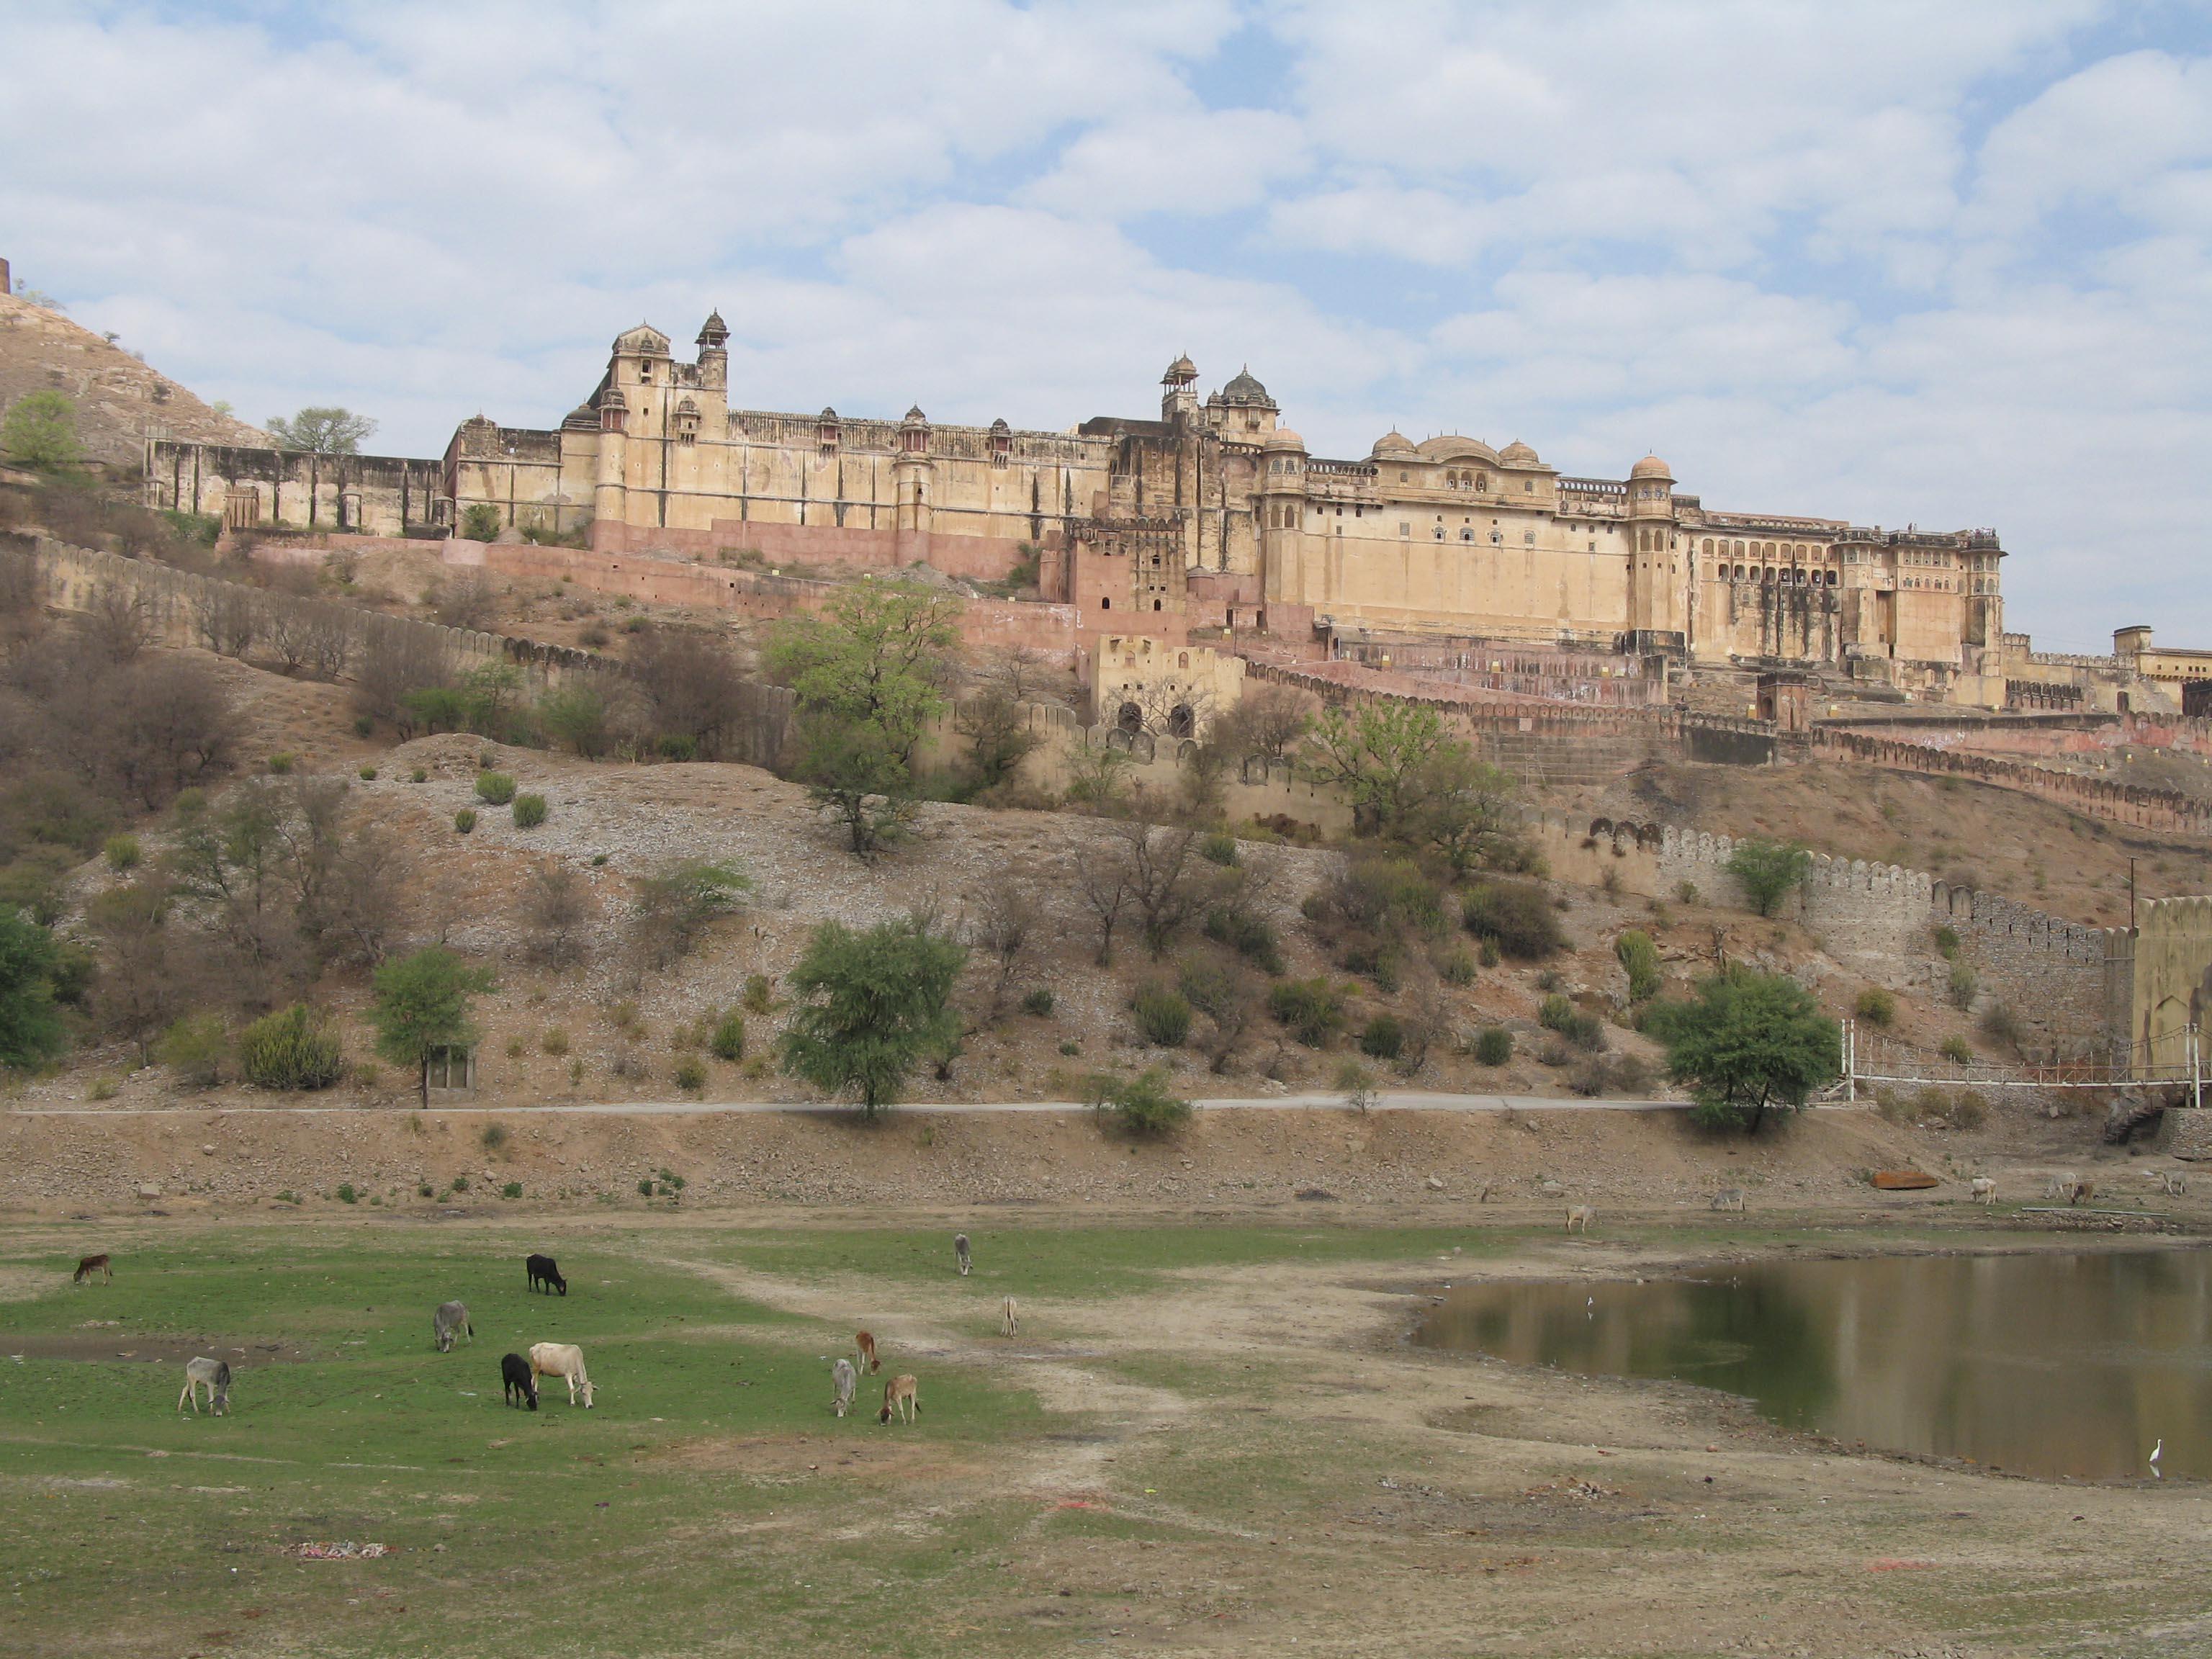 Wonders of India 2